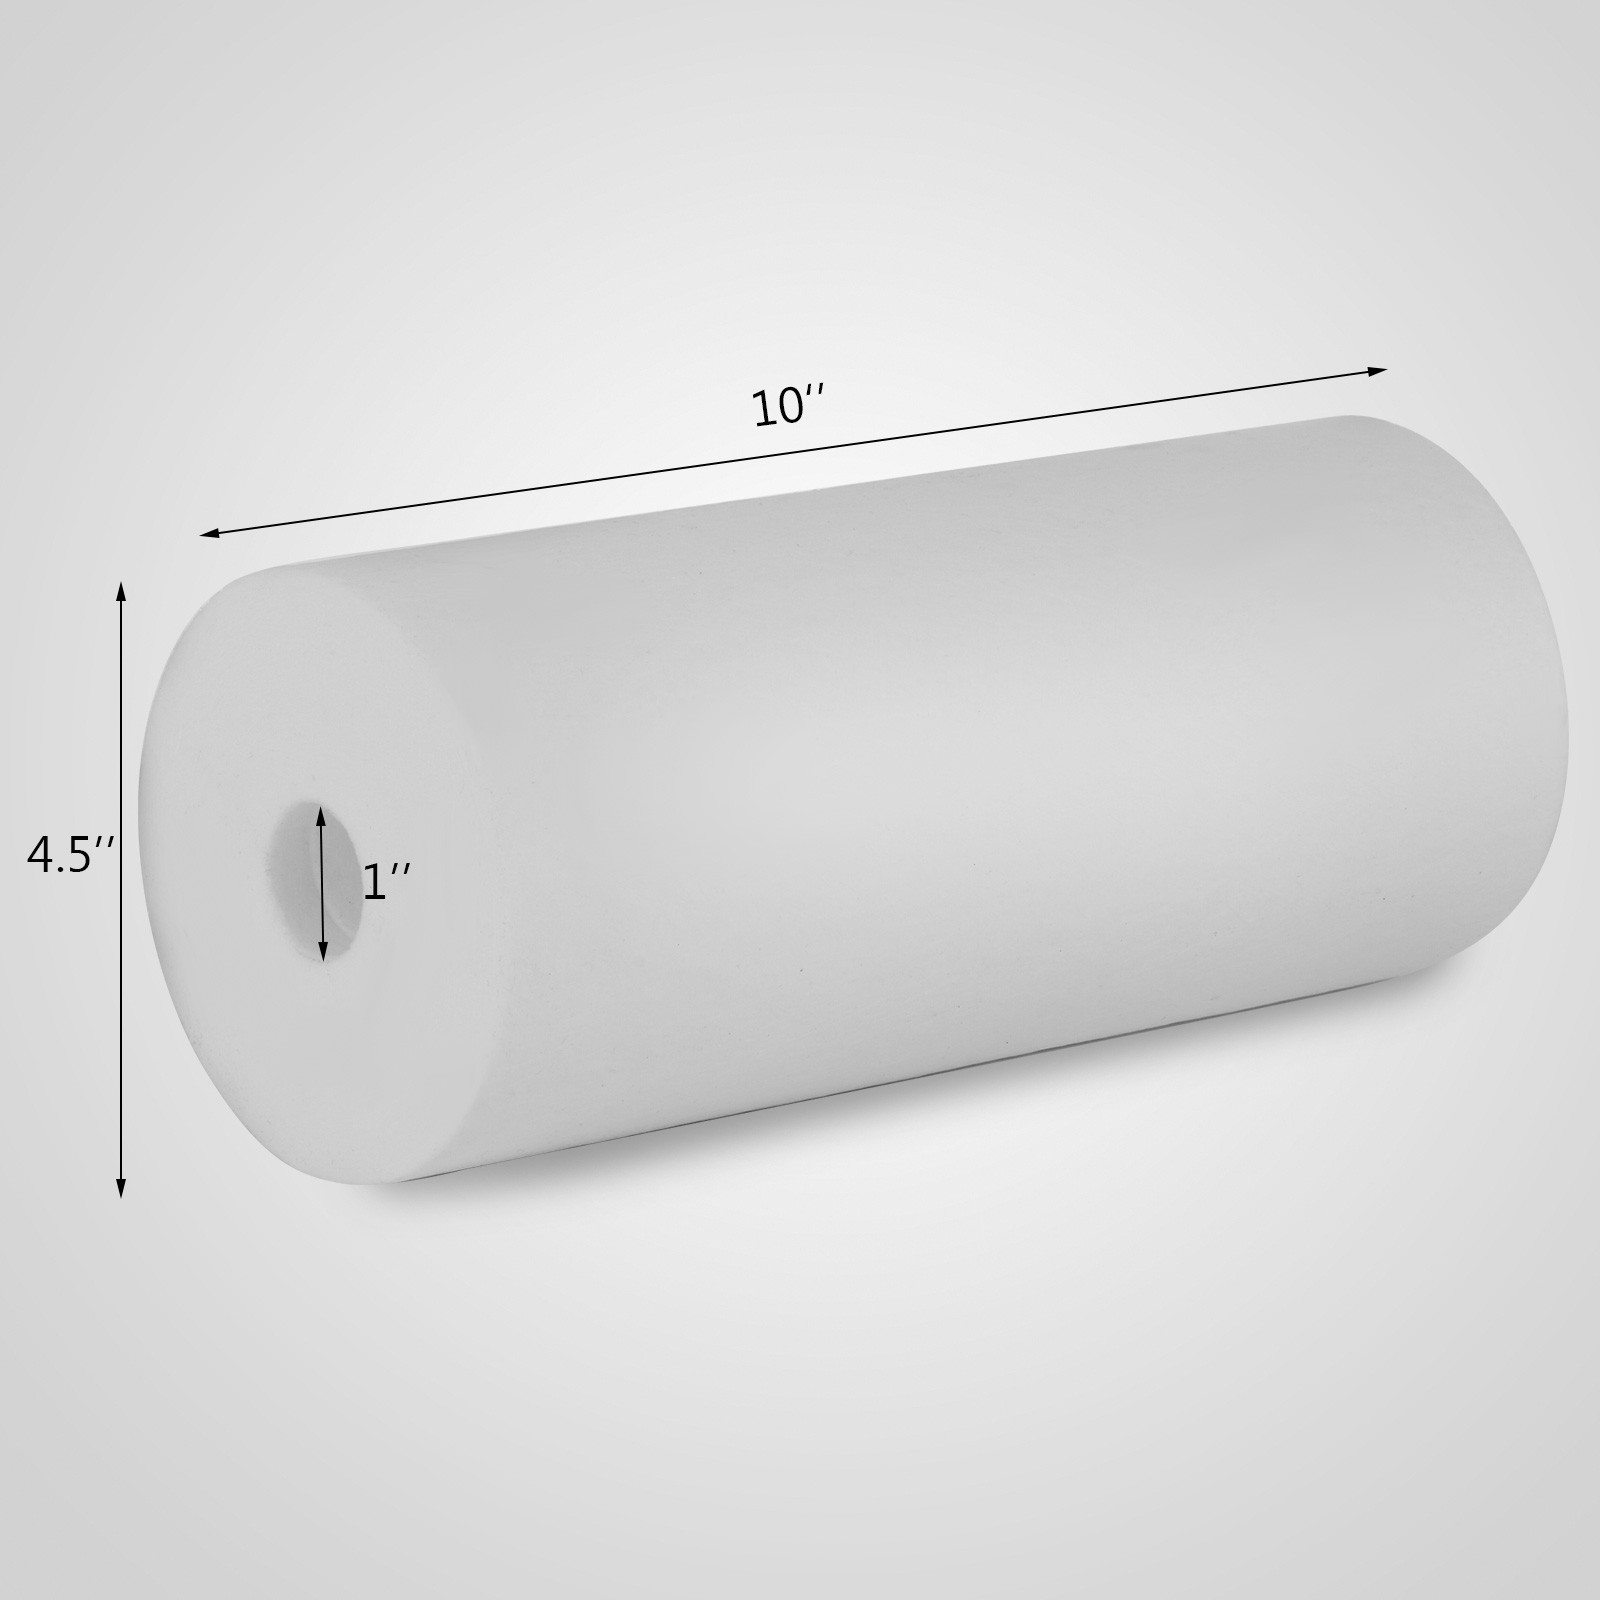 20Pcs-Cartouche-Filtre-a-eau-5-Micron-10-034-X-4-5-034-as-Brita-Bobine-Anti-boue miniature 2